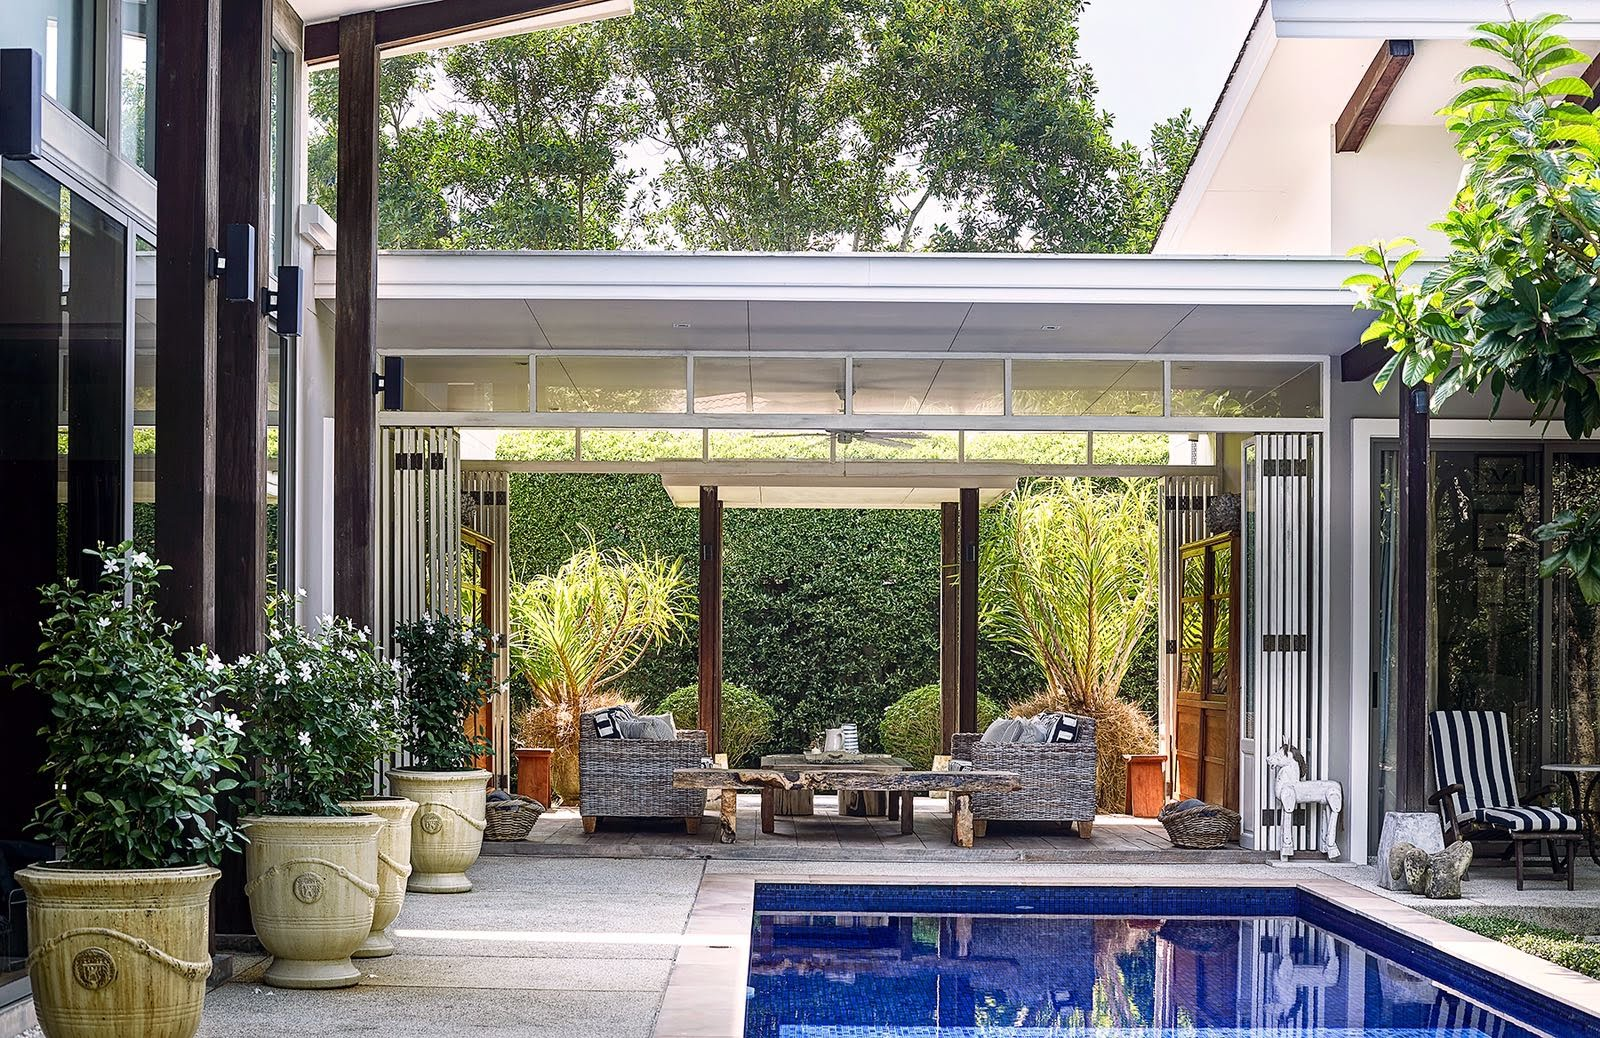 See Beautiful 3 Bed Pool Villa details